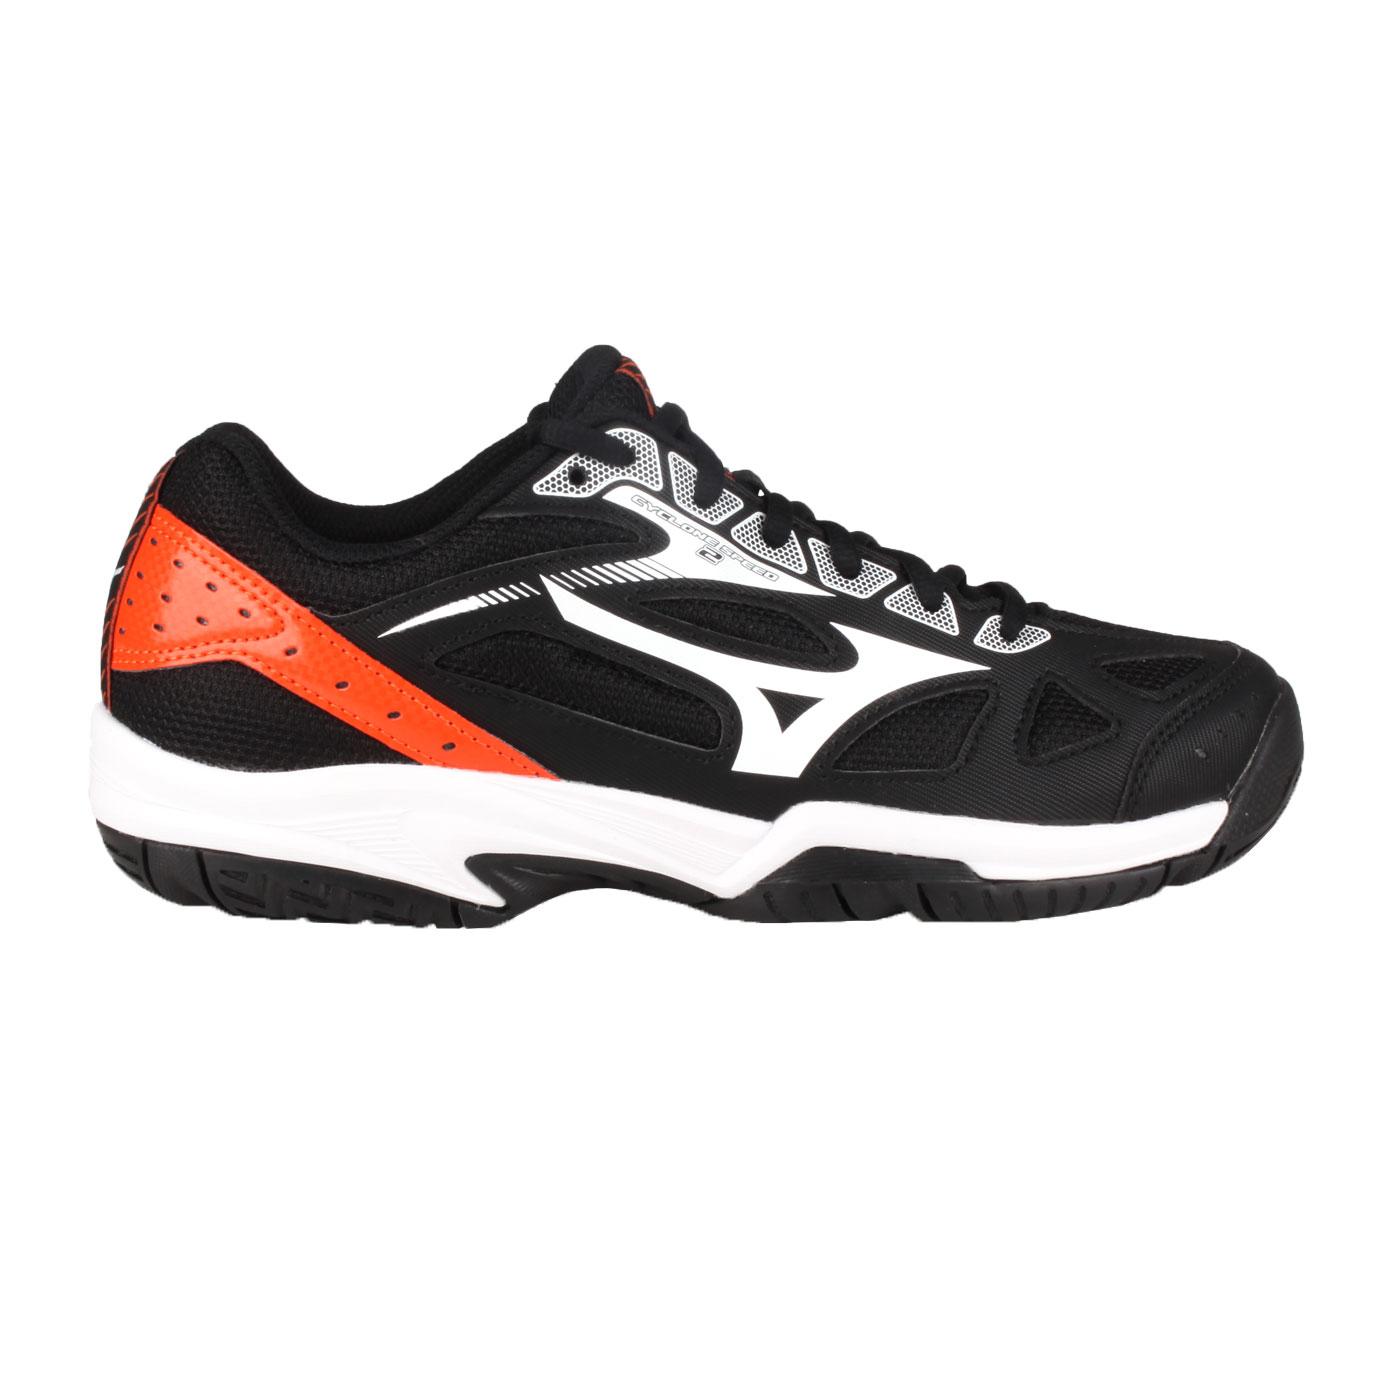 MIZUNO 排球鞋  @CYCLONE SPEED 2@V1GA198002 - 黑橘白